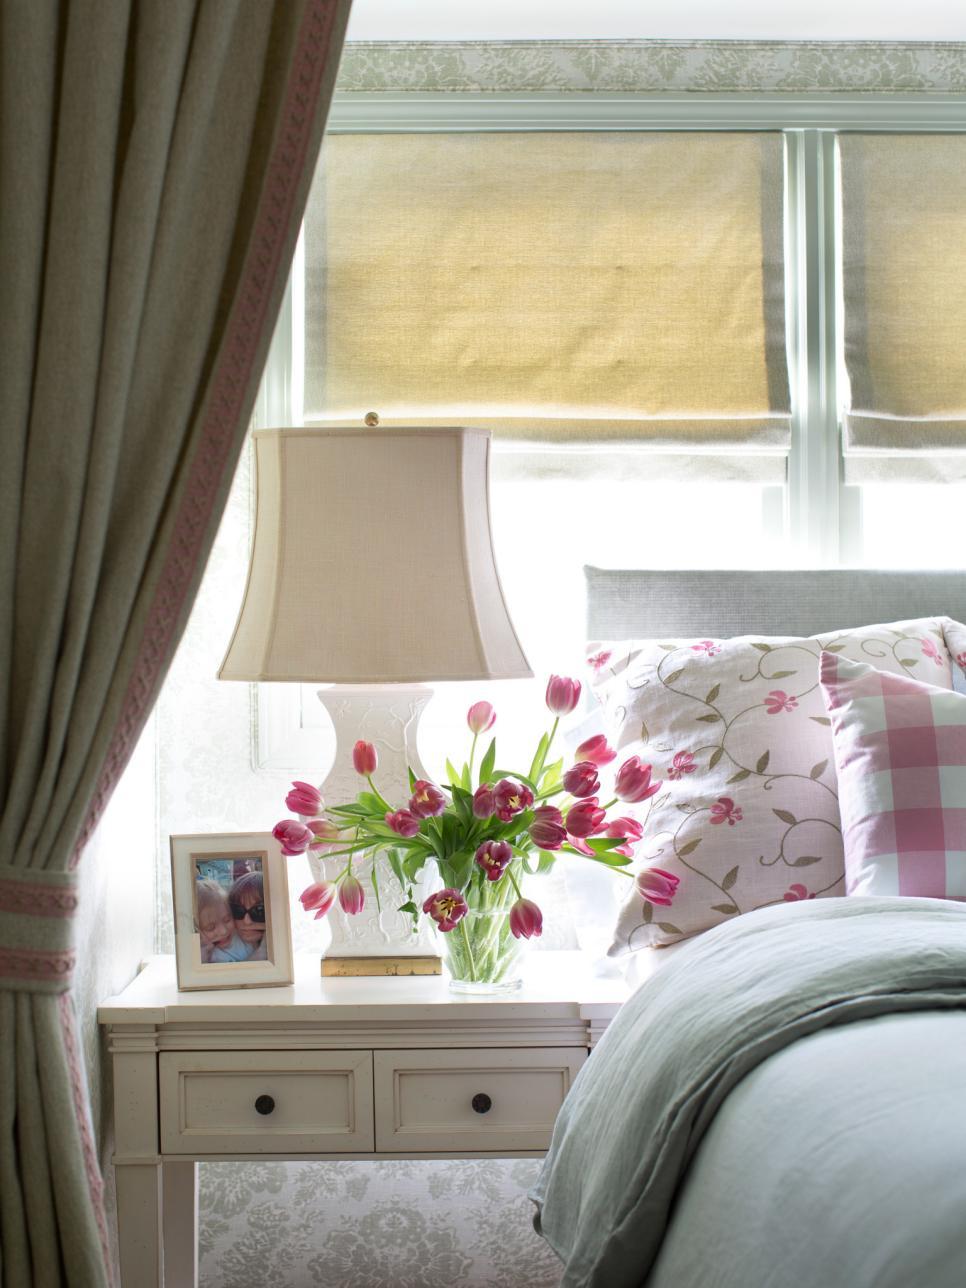 BPF_Spring-House_interior_cottage-bedroom-decor_fabrics_v.jpg.rend.hgtvcom.966.1288